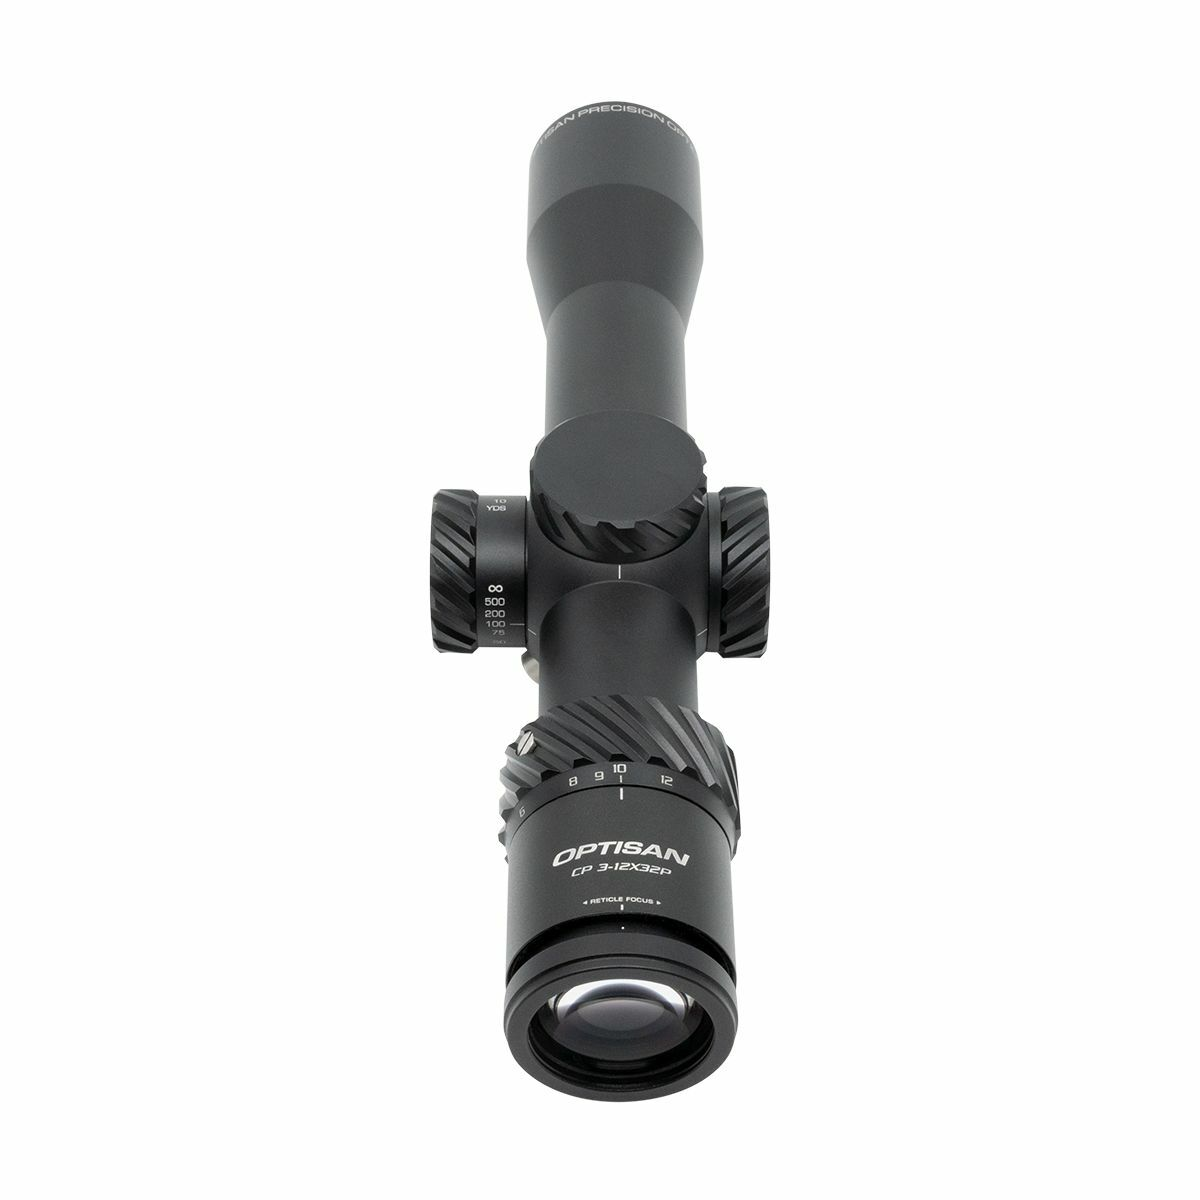 Optisan CP Compact 3-12x32 SFP MIL Non-Illuminated